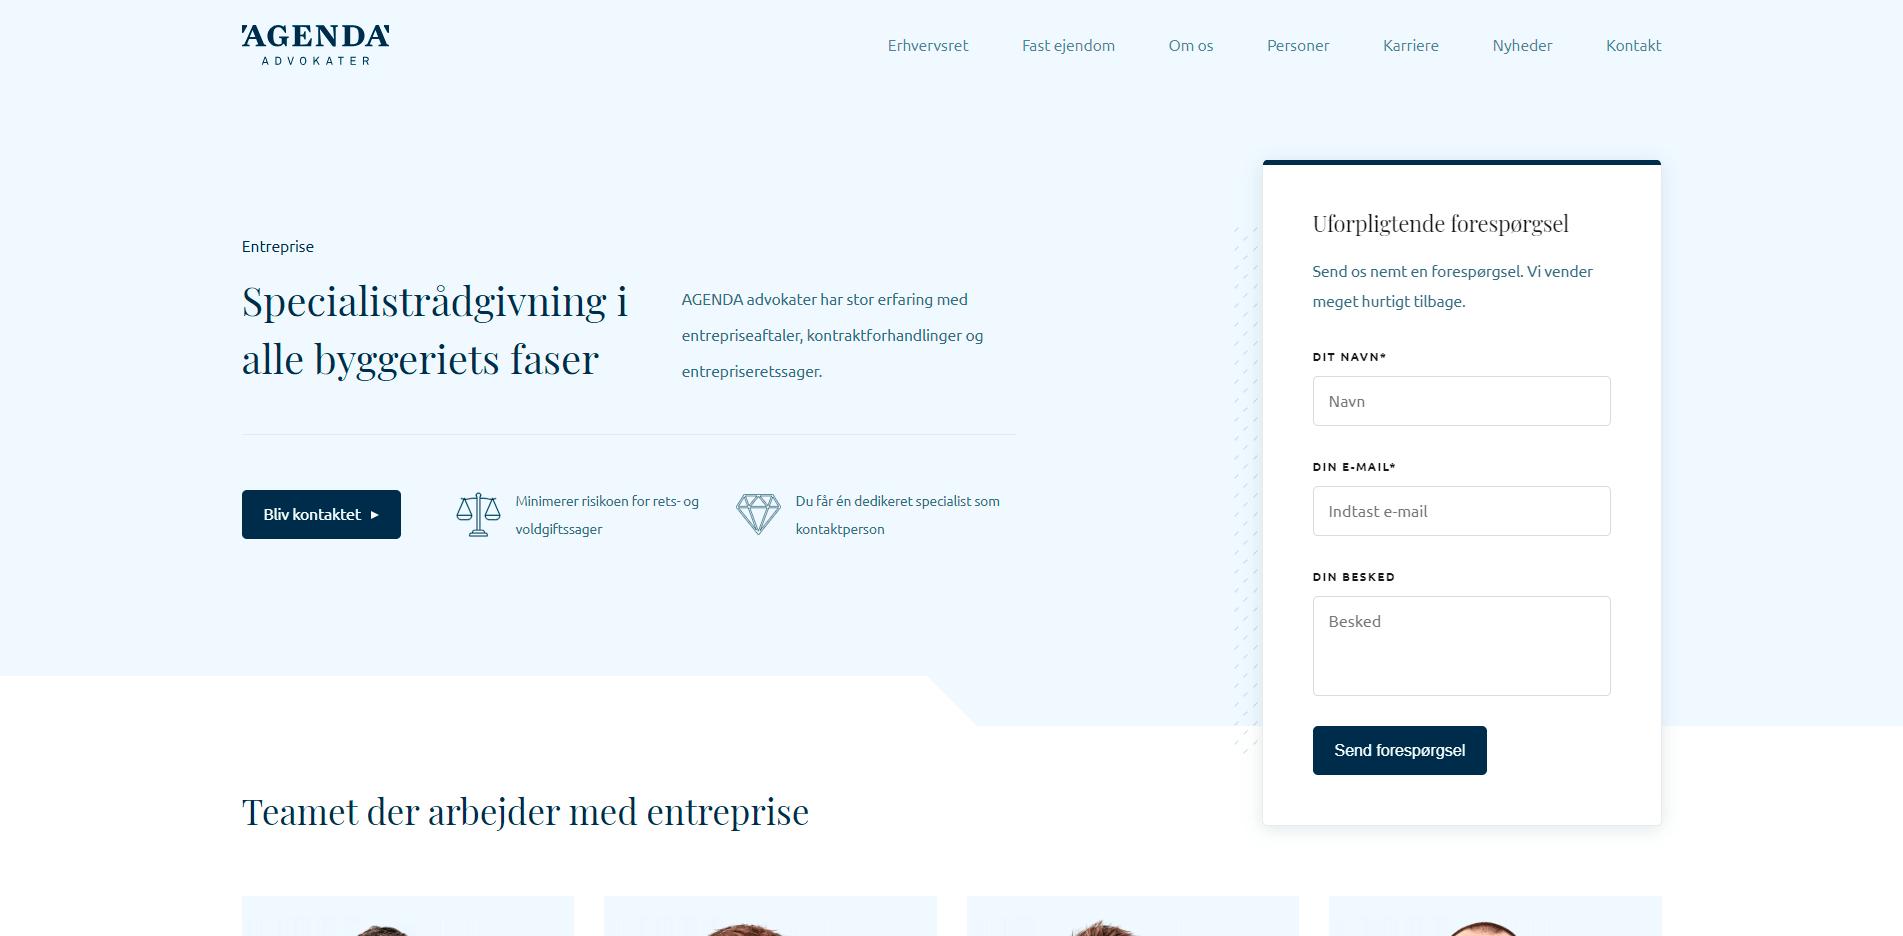 agenda-enterprise